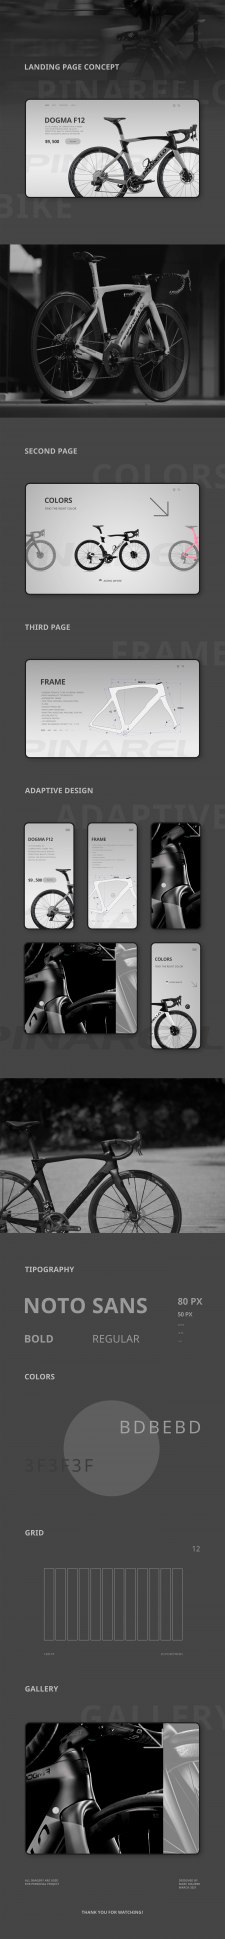 Лендинг для Pinarello bike